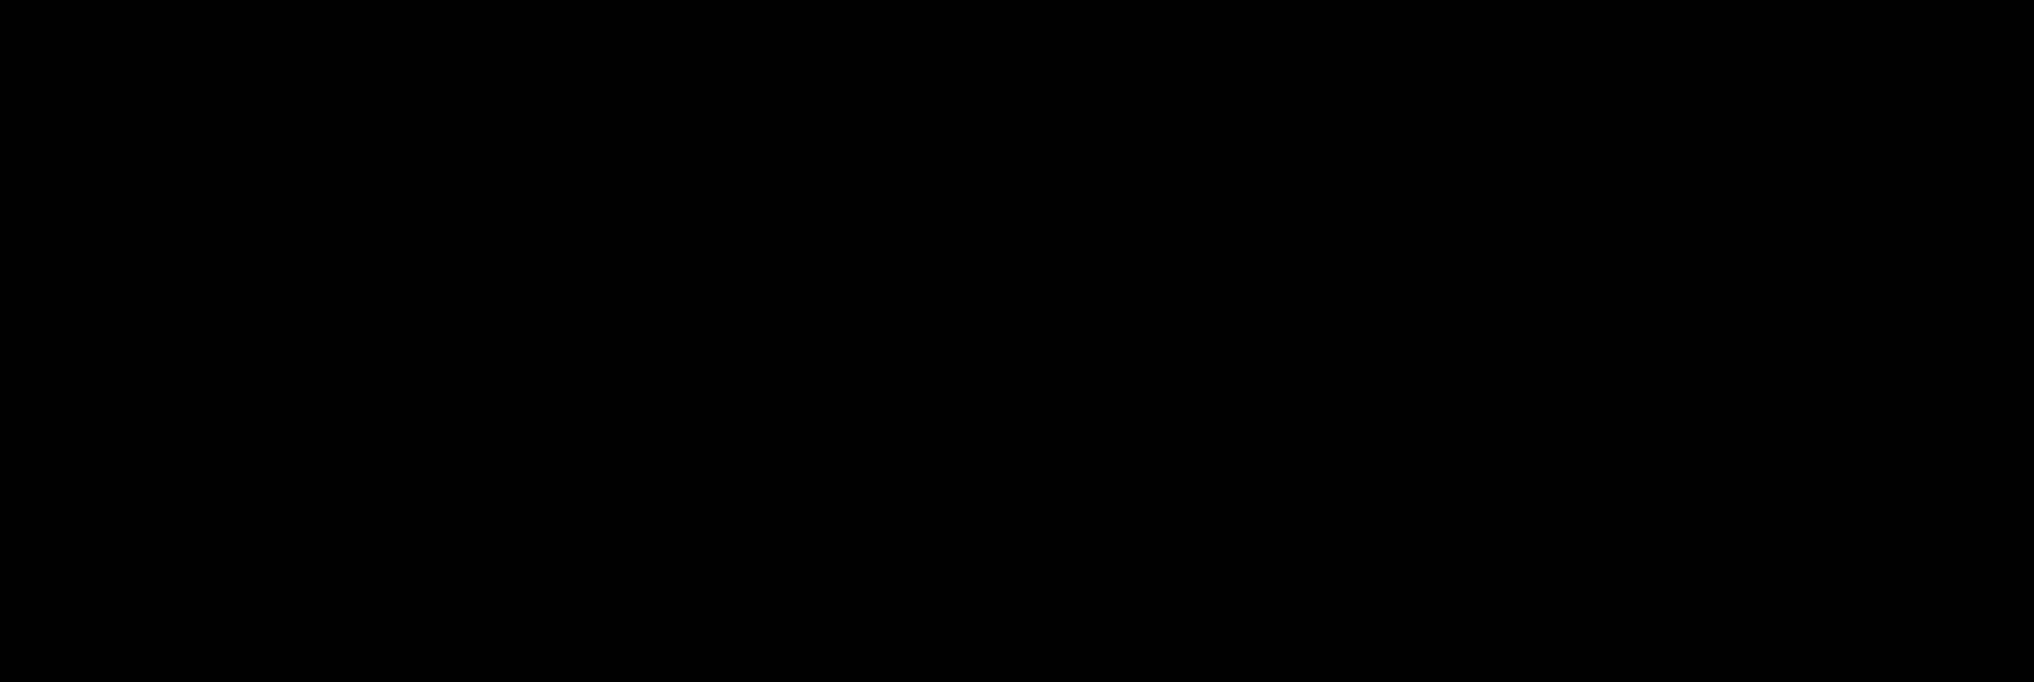 Nb-Feruloyl-d<sub>3</sub>-tryptamine